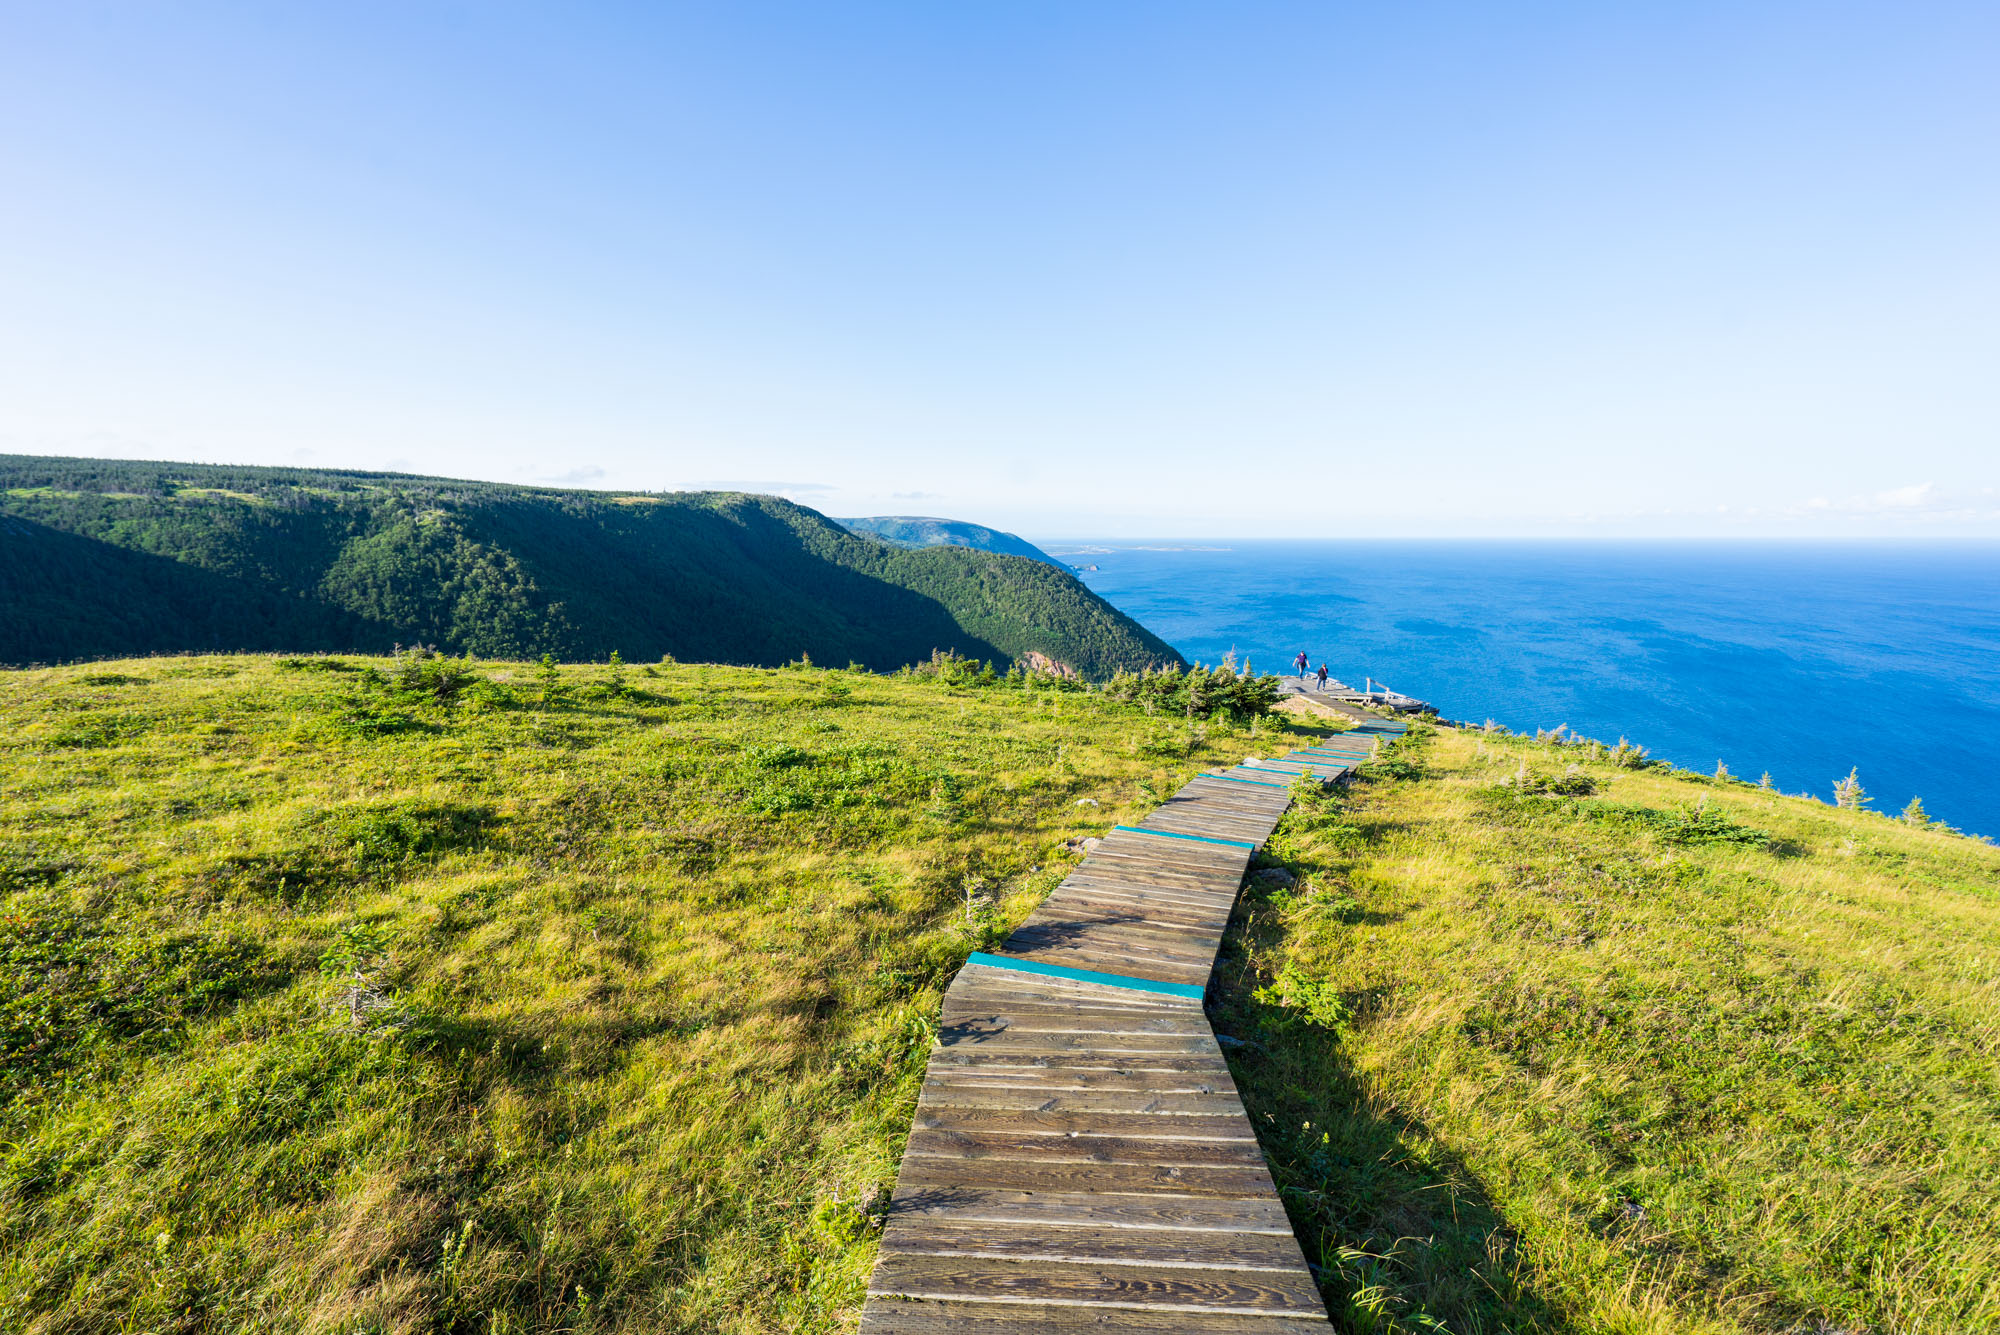 Boardwalk section of the Skyline Hike in Cape Breton, NP